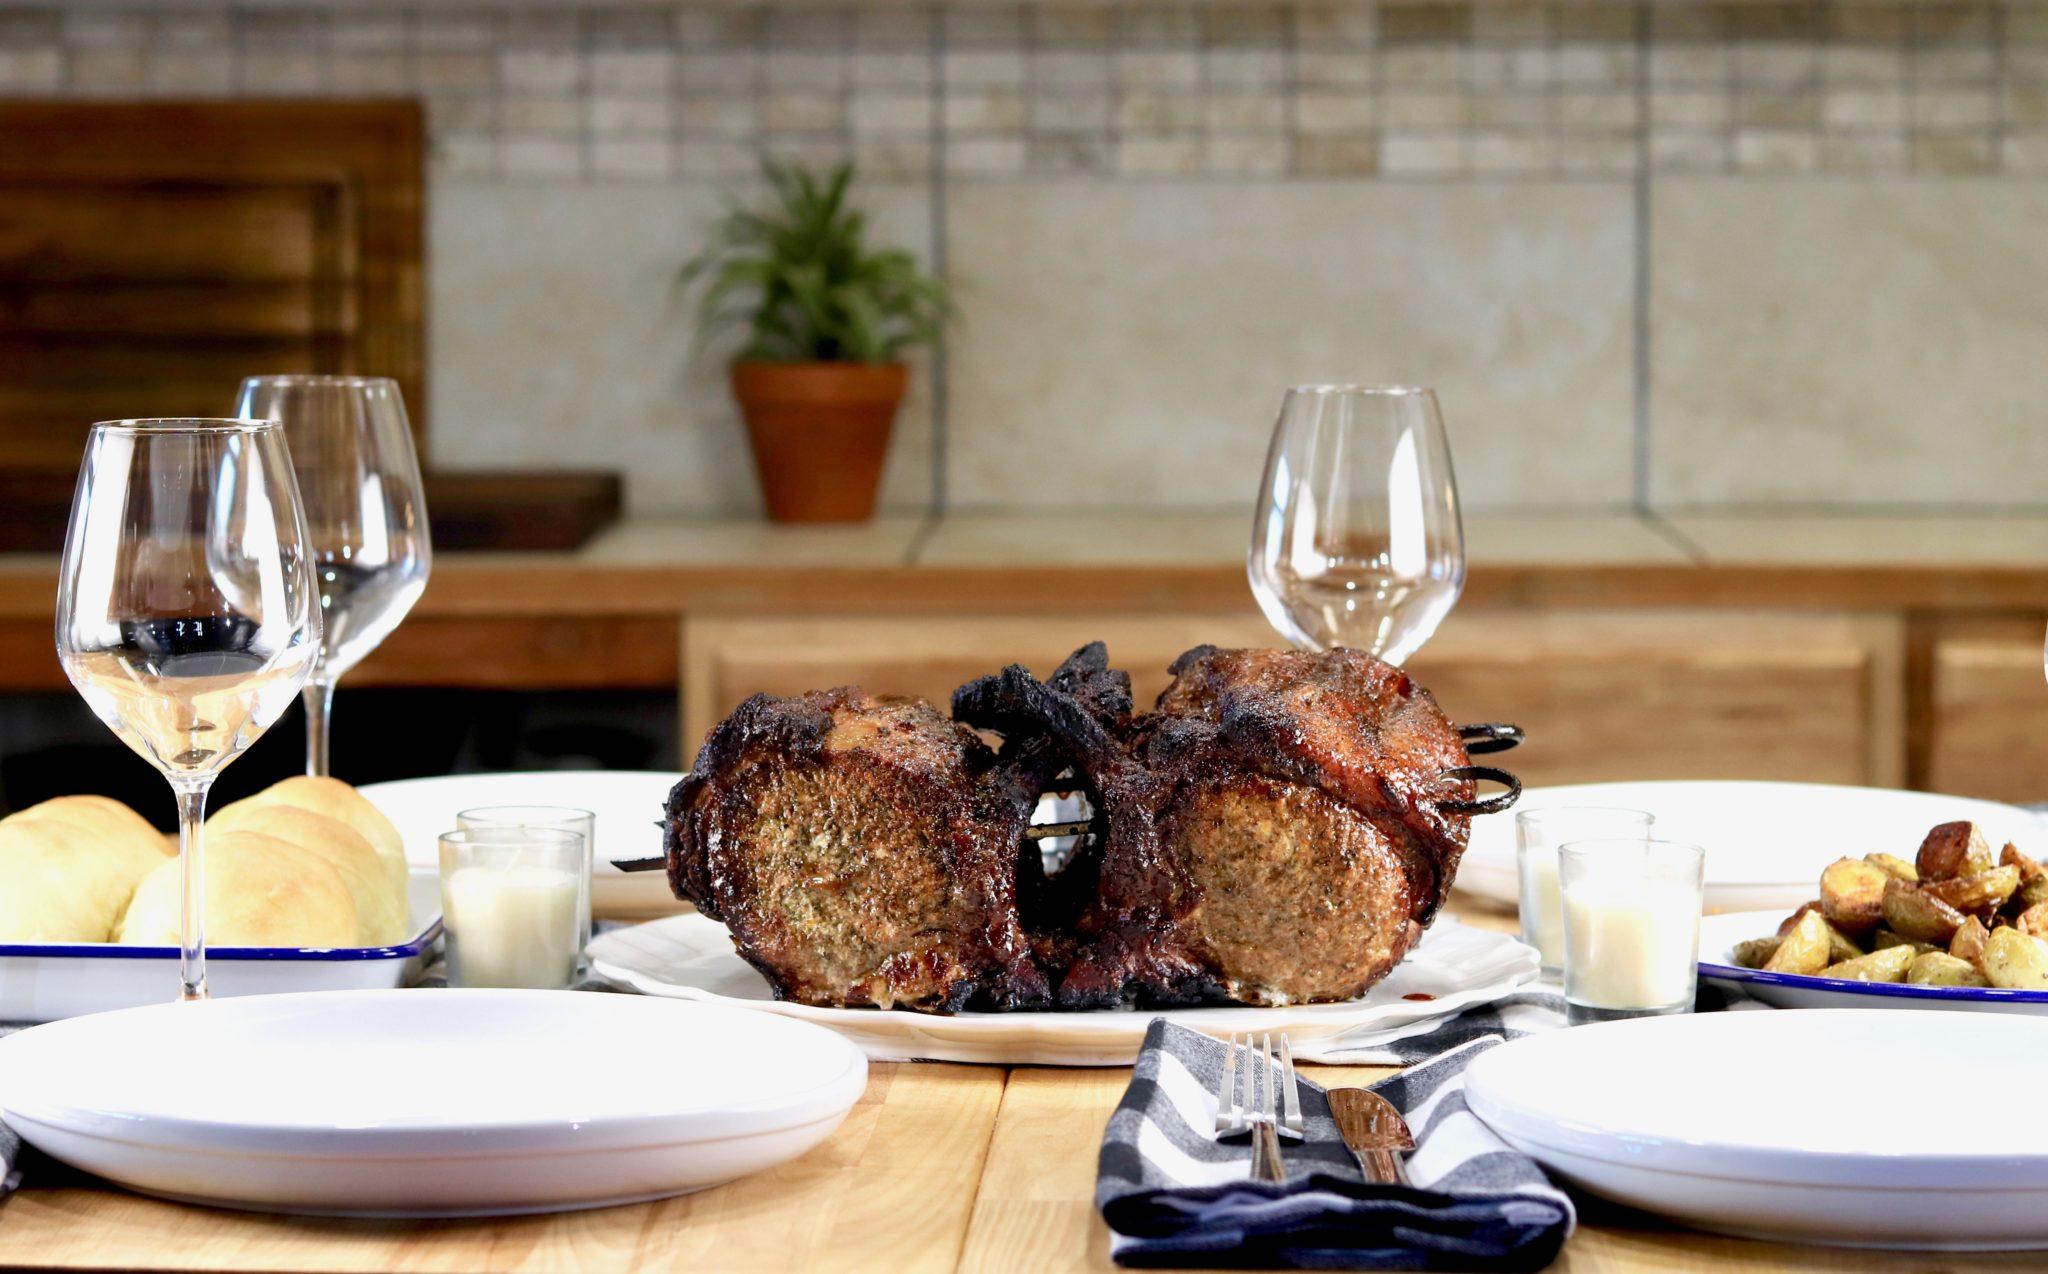 Table setting with pork rib roast